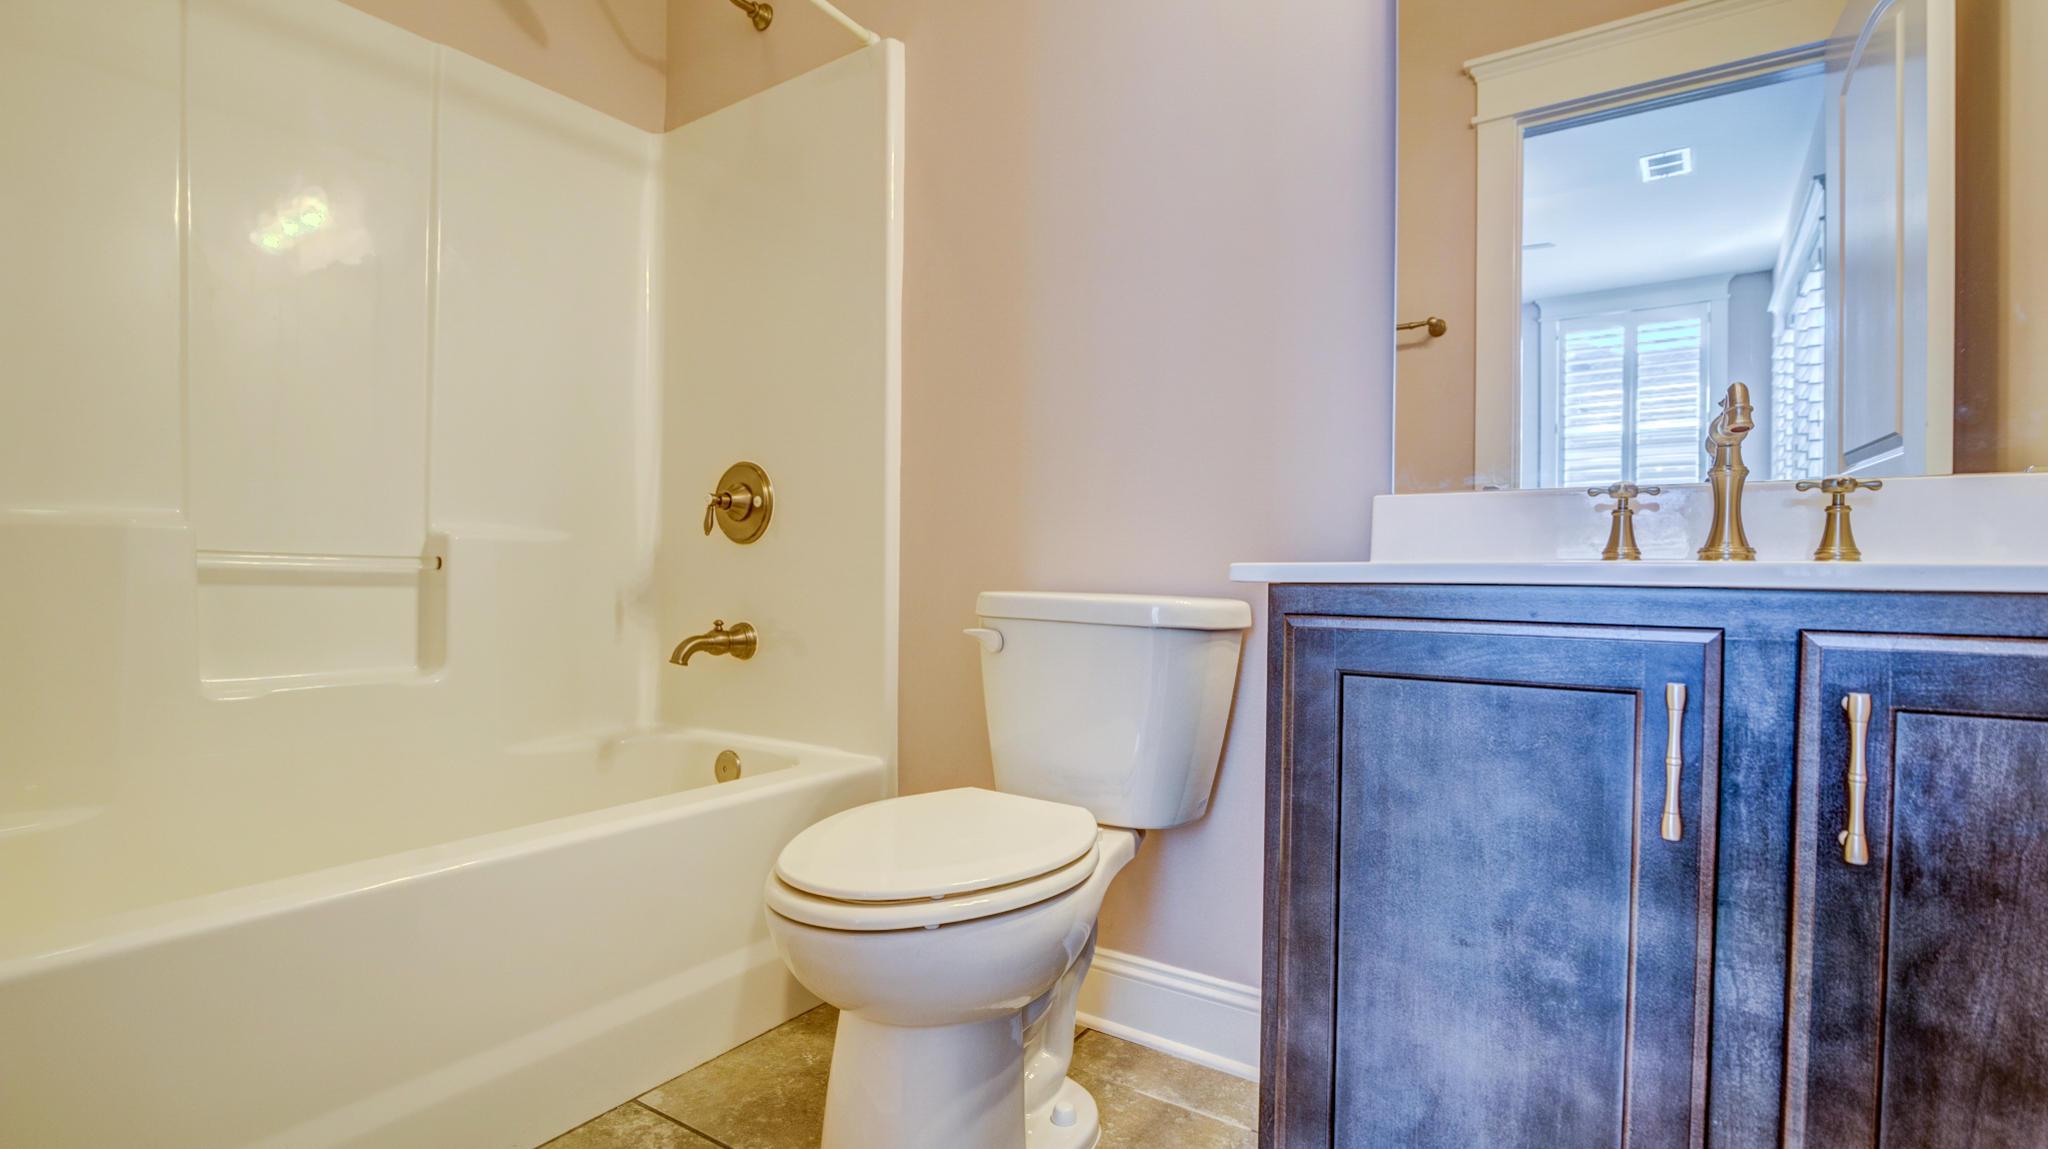 Carolina Park Homes For Sale - 3687 Spindrift, Mount Pleasant, SC - 27